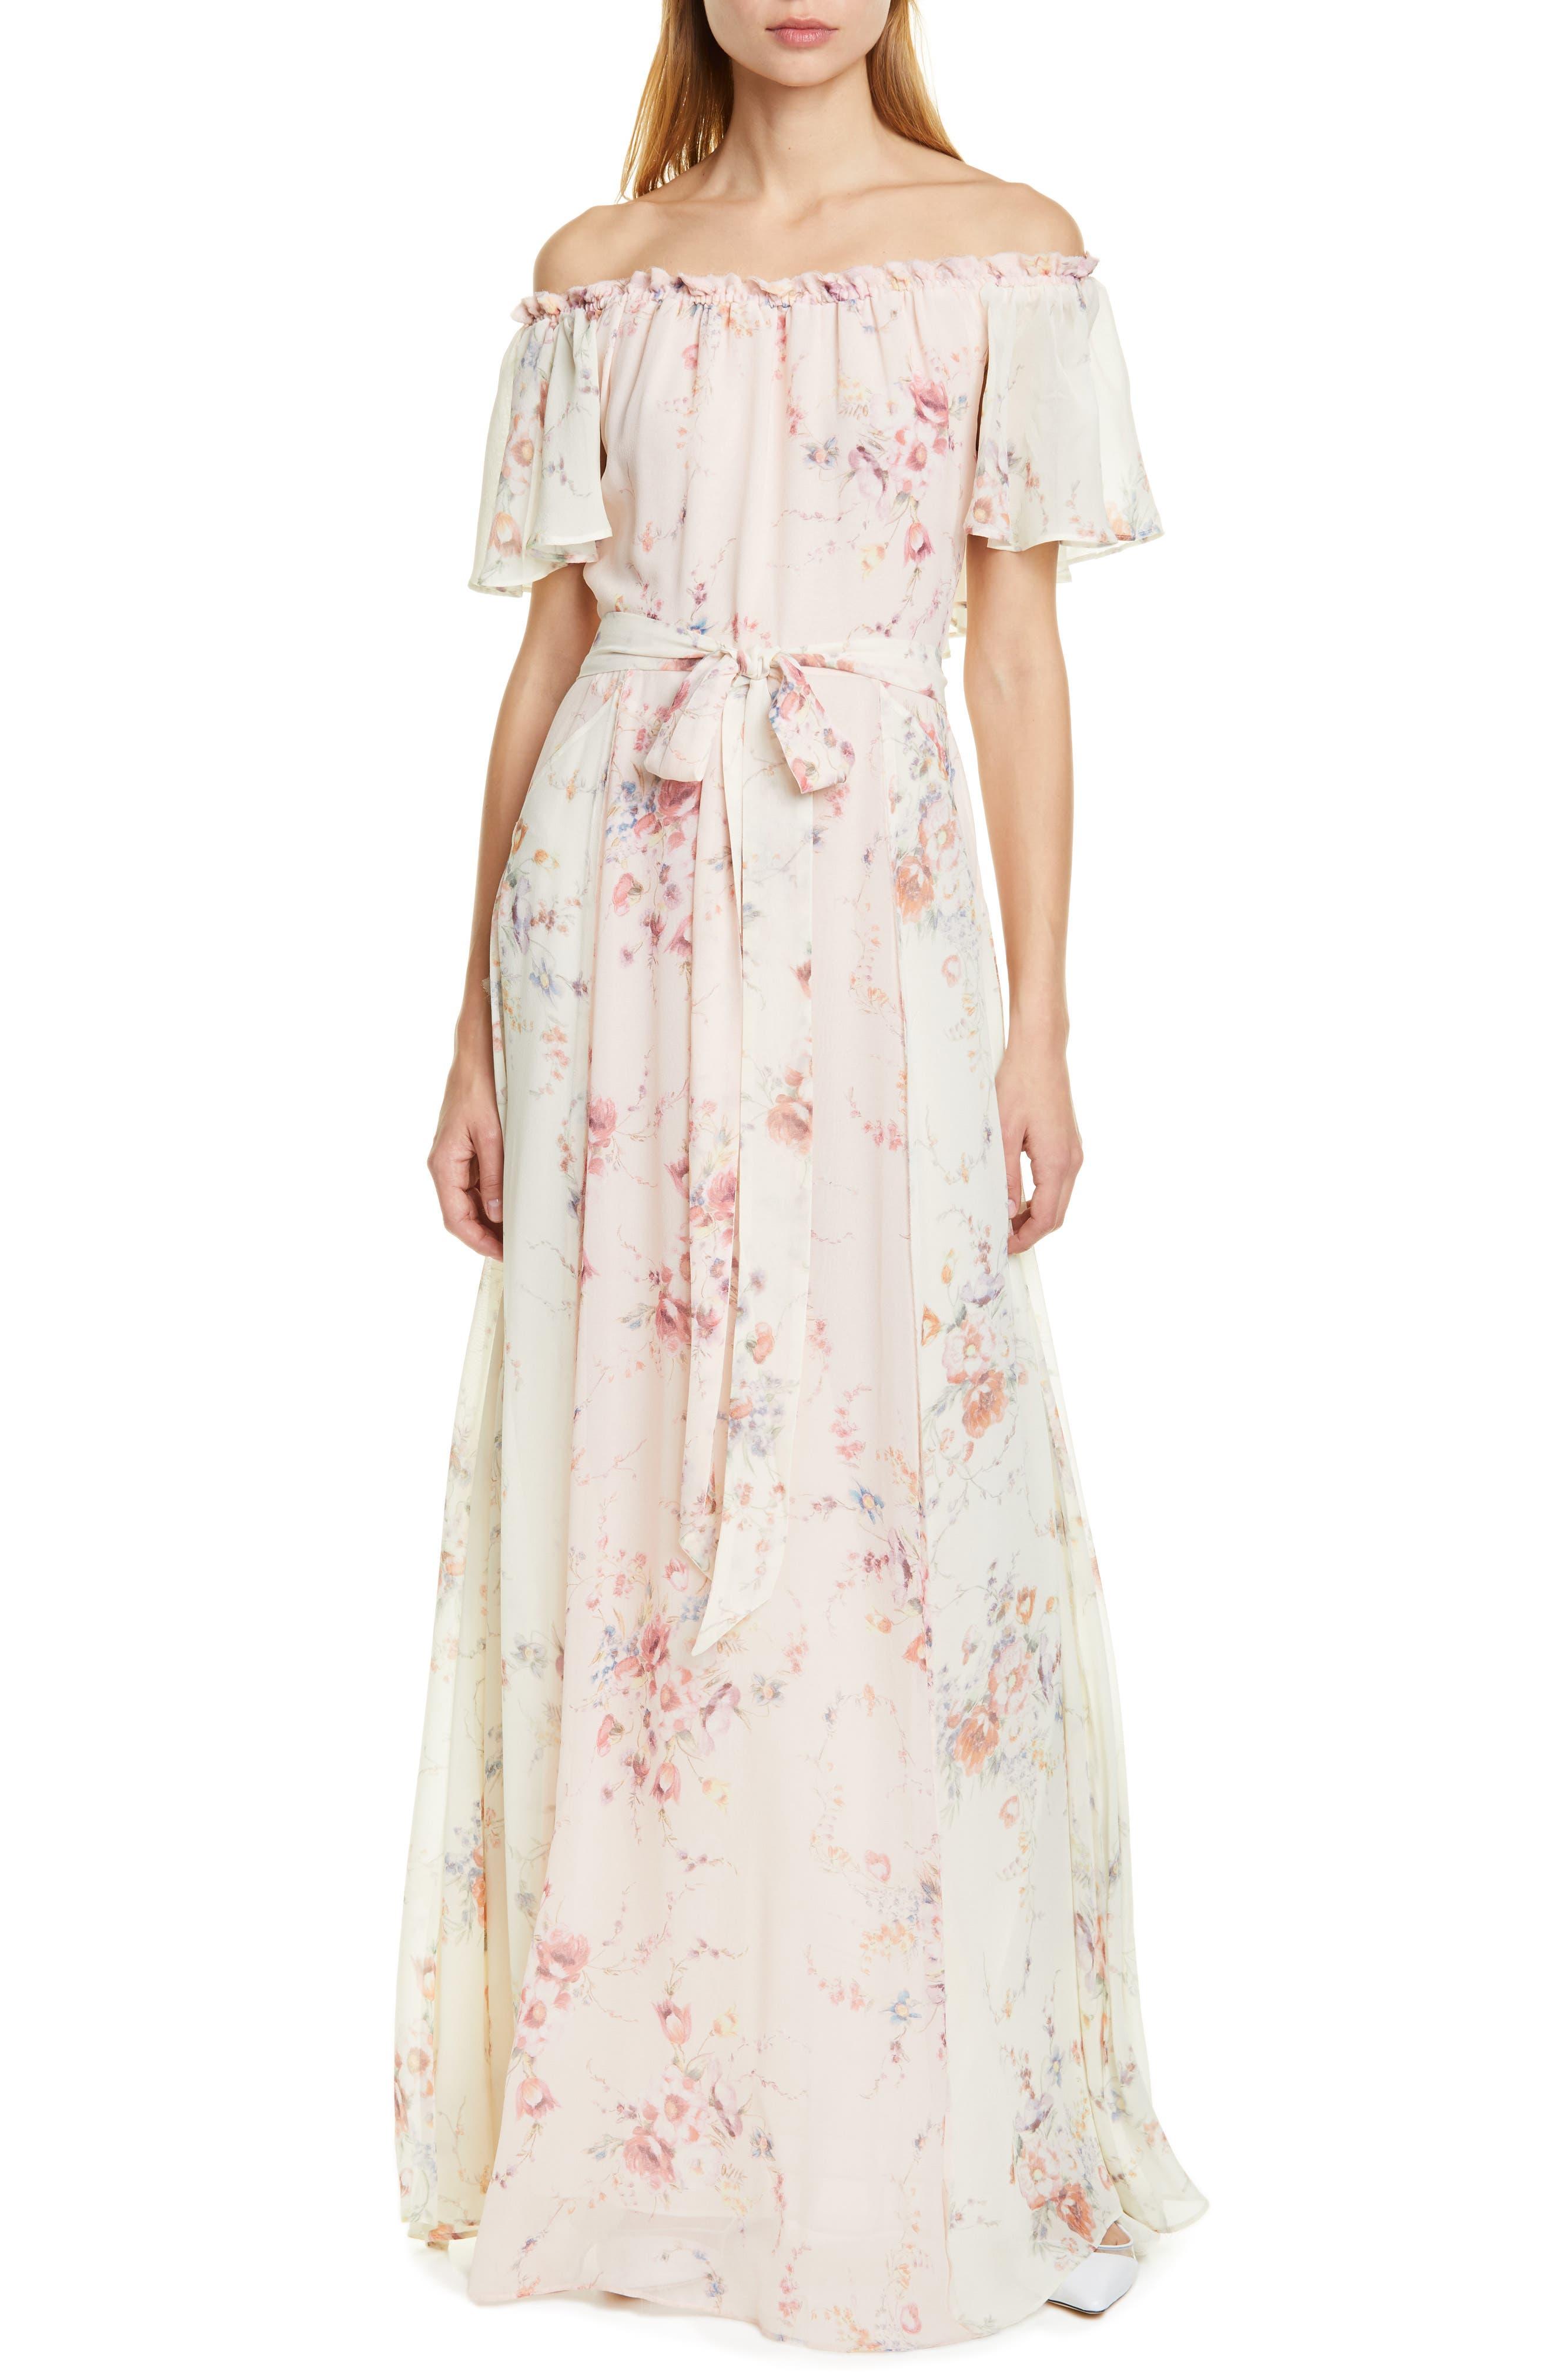 Loveshackfancy Evelyn Maxi Dress, Pink